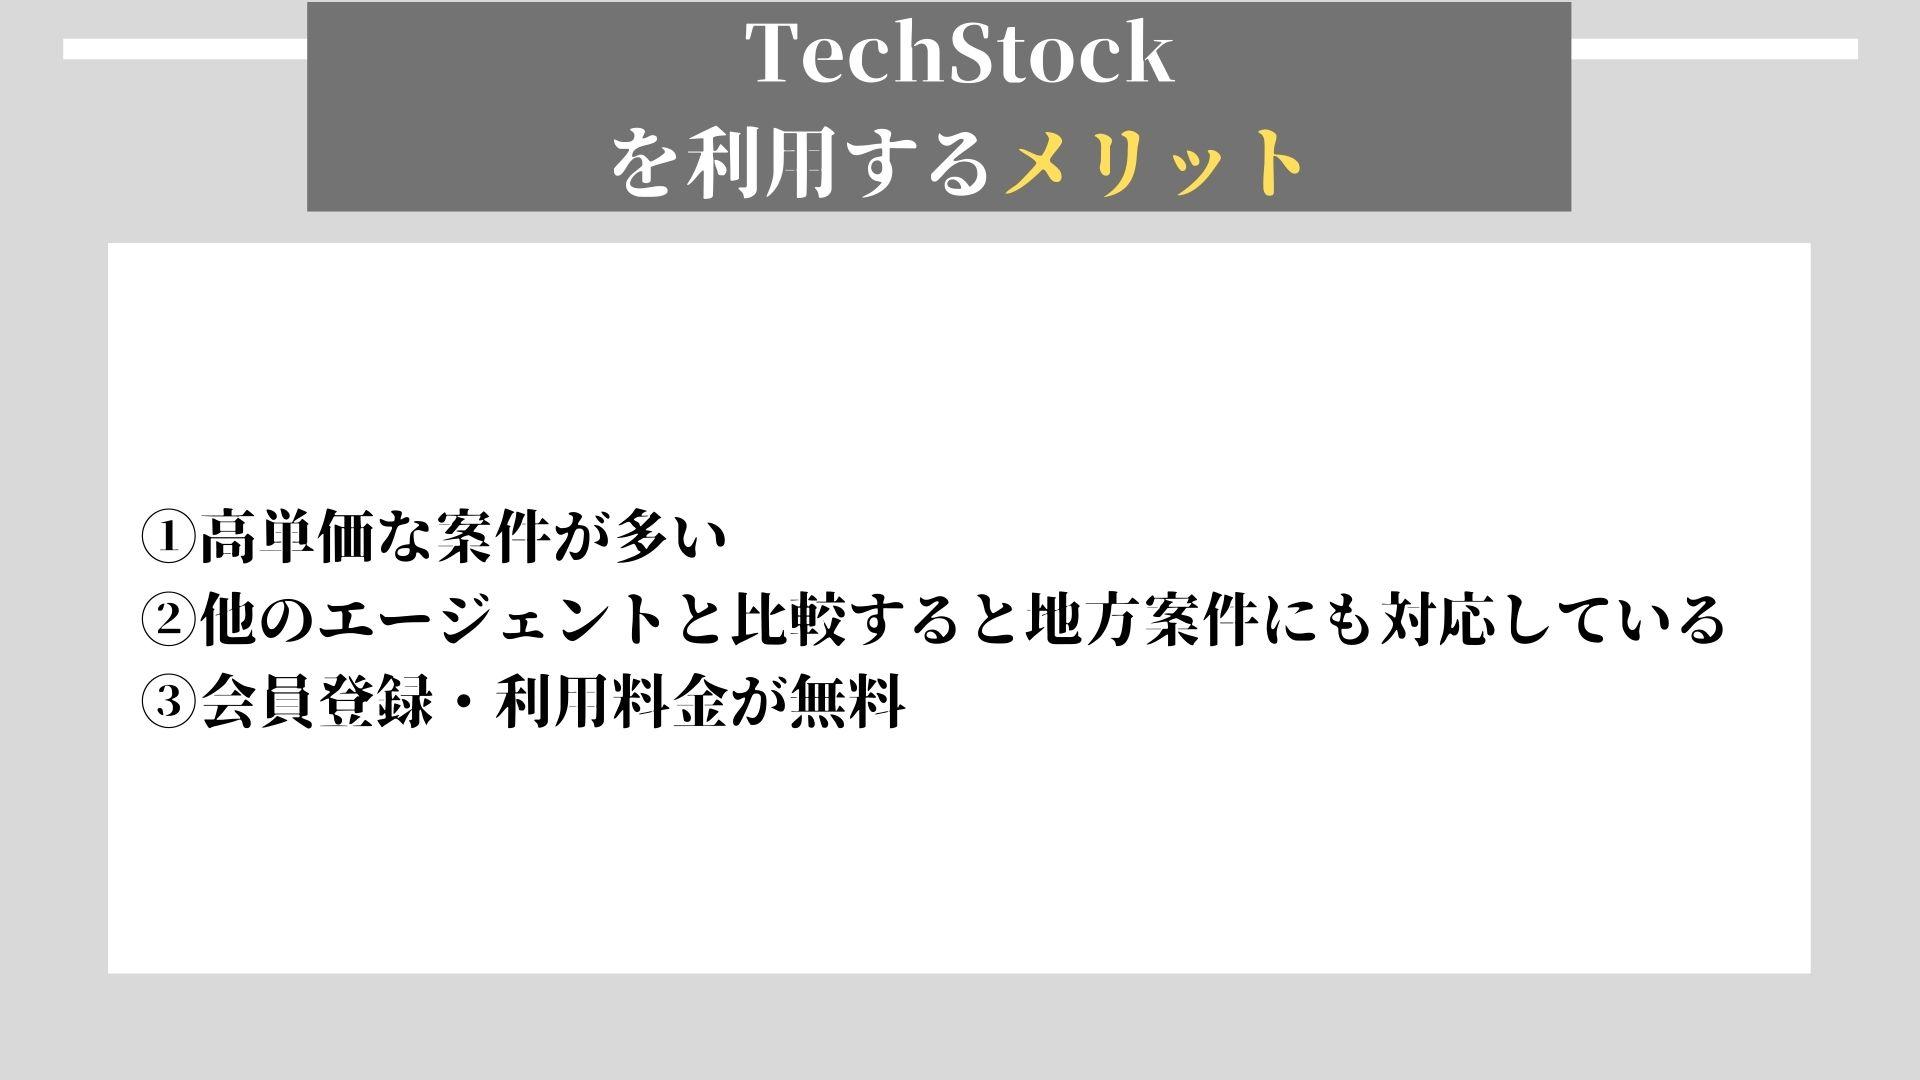 Tech Stock メリット